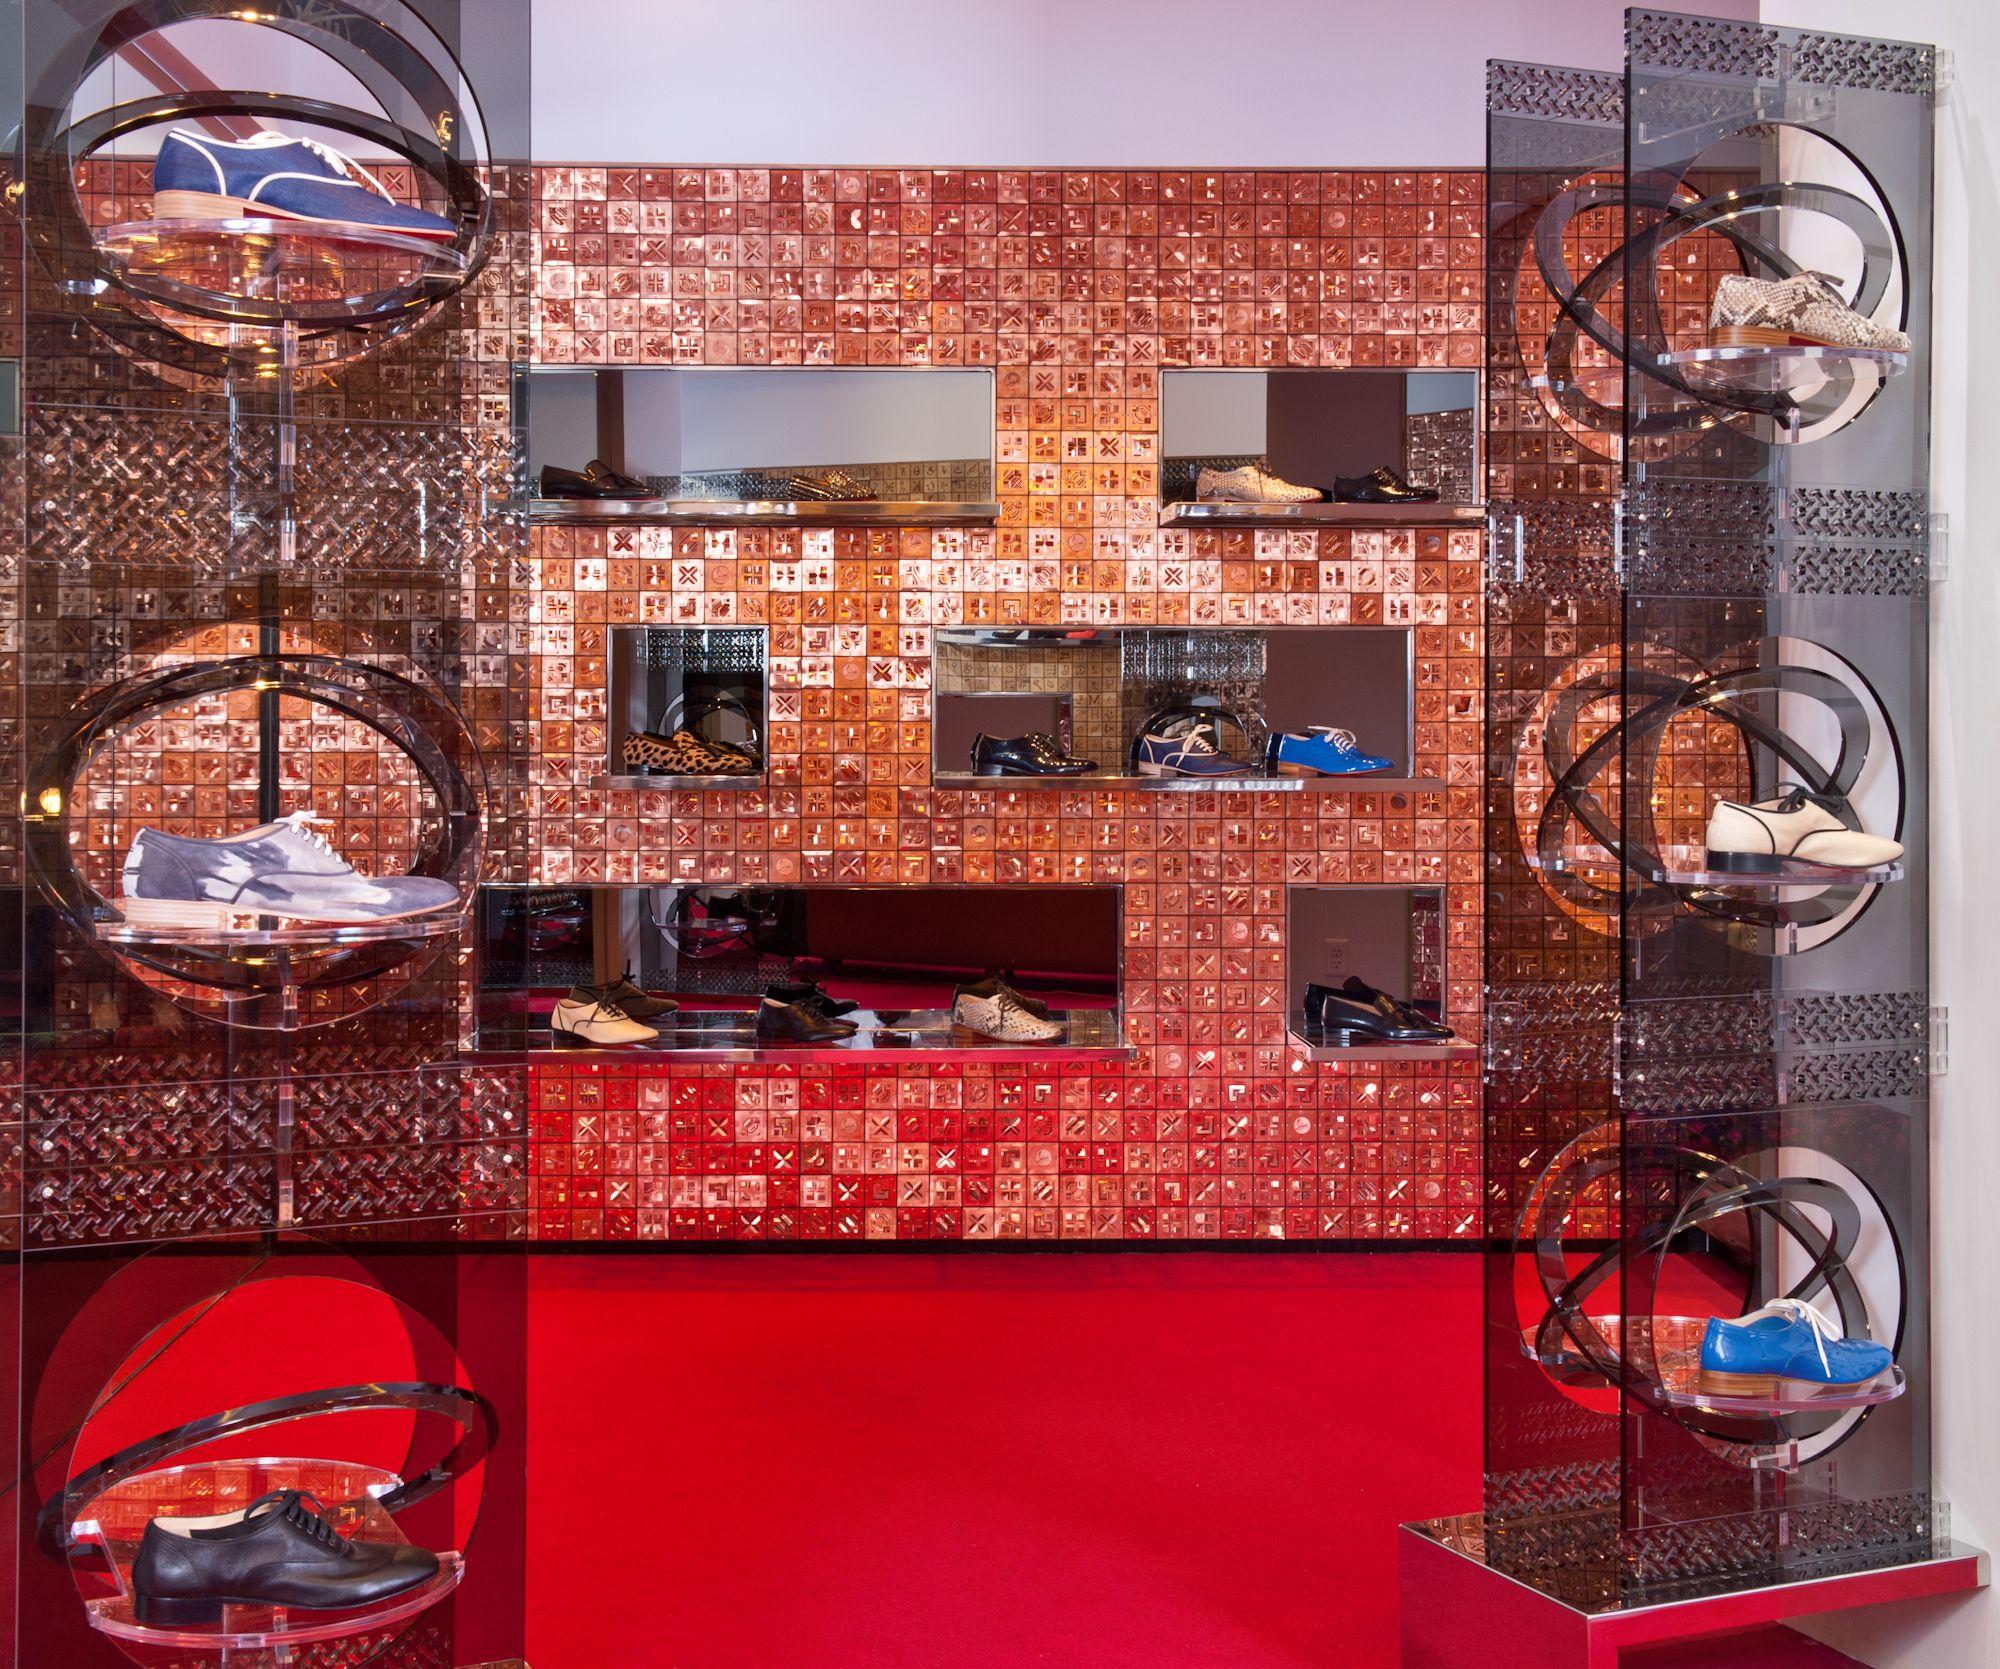 Christian Louboutin, Forum shops in Las Vegas | Las vegas ...